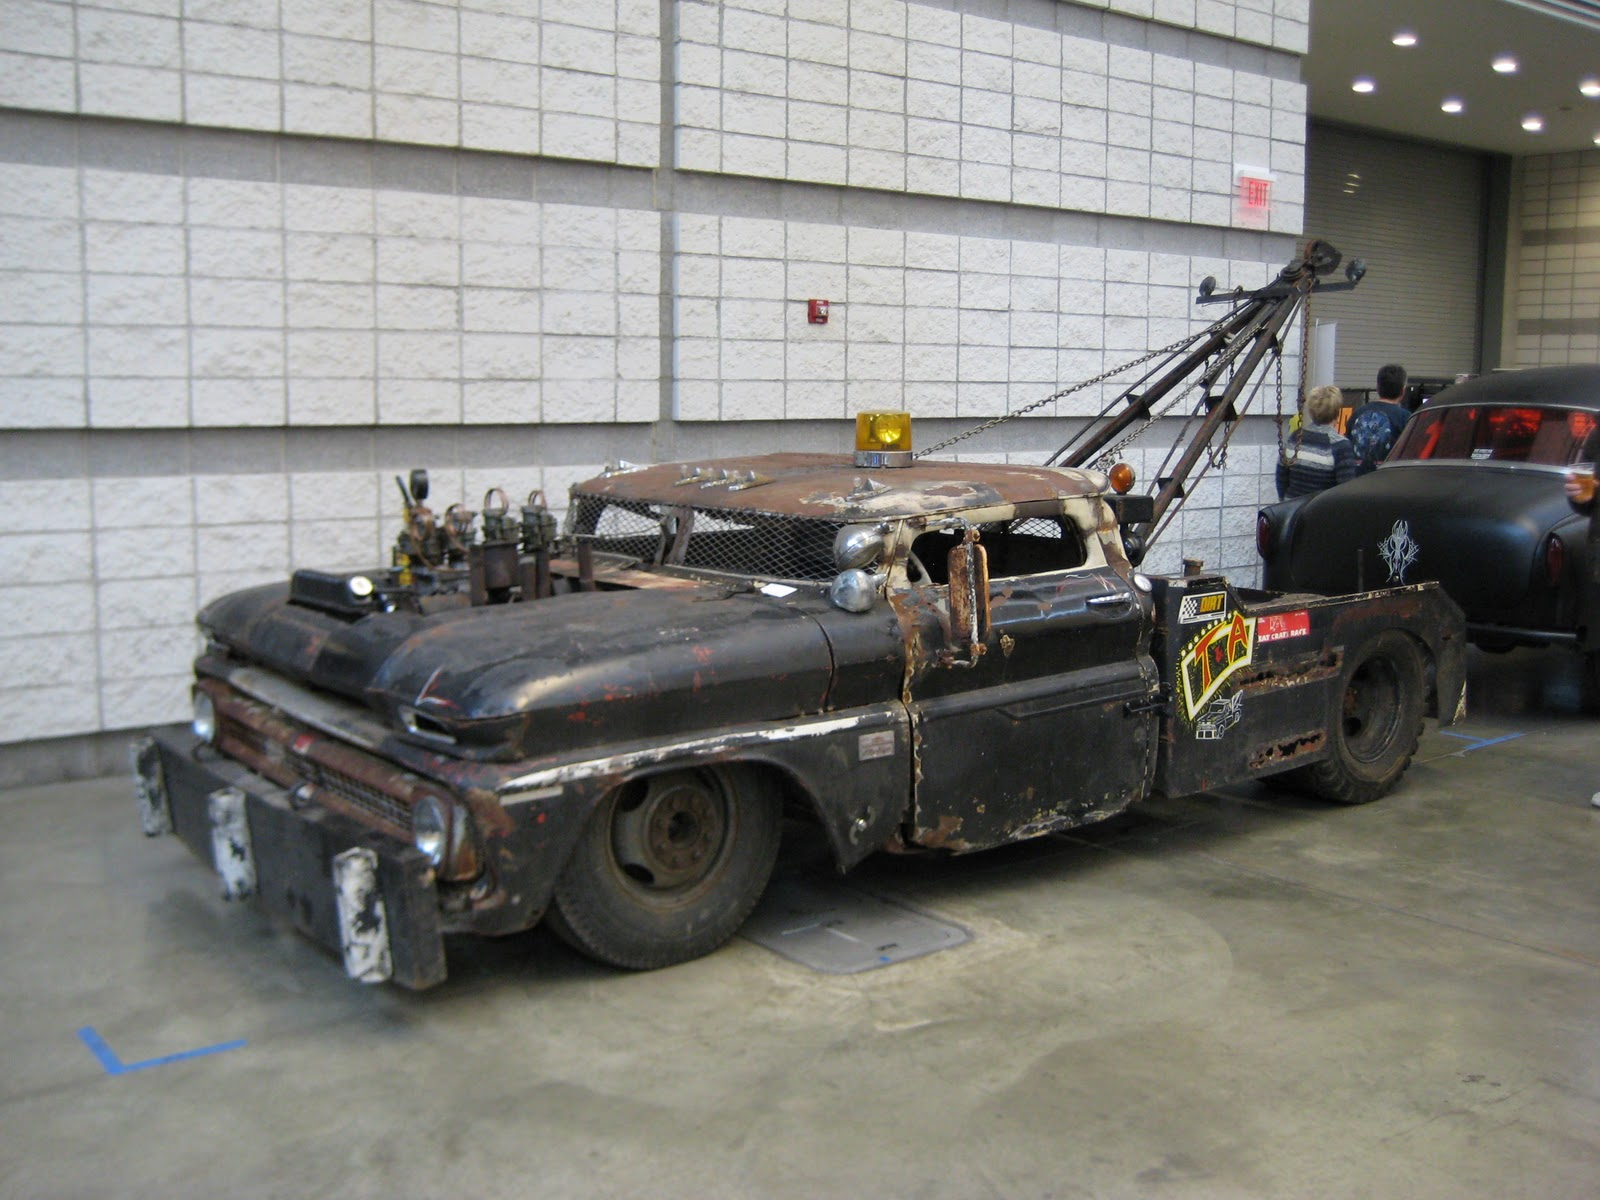 http://4.bp.blogspot.com/_jnLgmcDOO4w/TSPXseGbhPI/AAAAAAAAAKY/rssIOoIFXJ8/s1600/Rat_Rod_Tow_Truck_by_RedlineGearhead%20%281%29.jpg